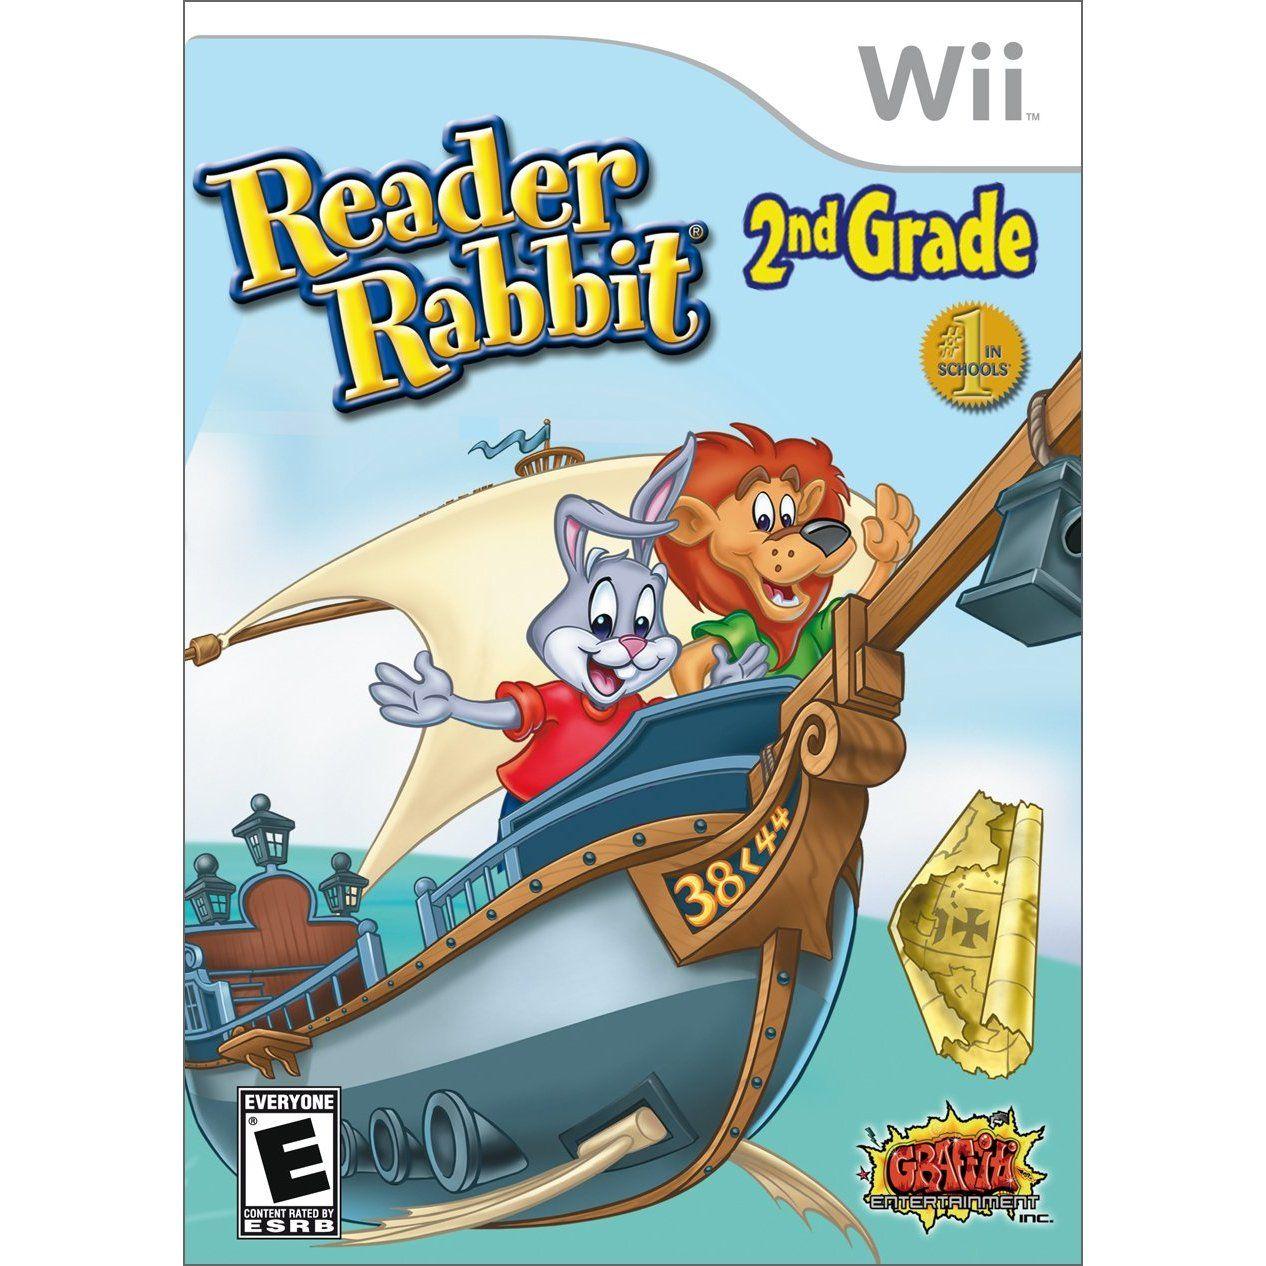 Wii Reader Rabbit 2nd grade Wii, 2nd grade, Nintendo wii